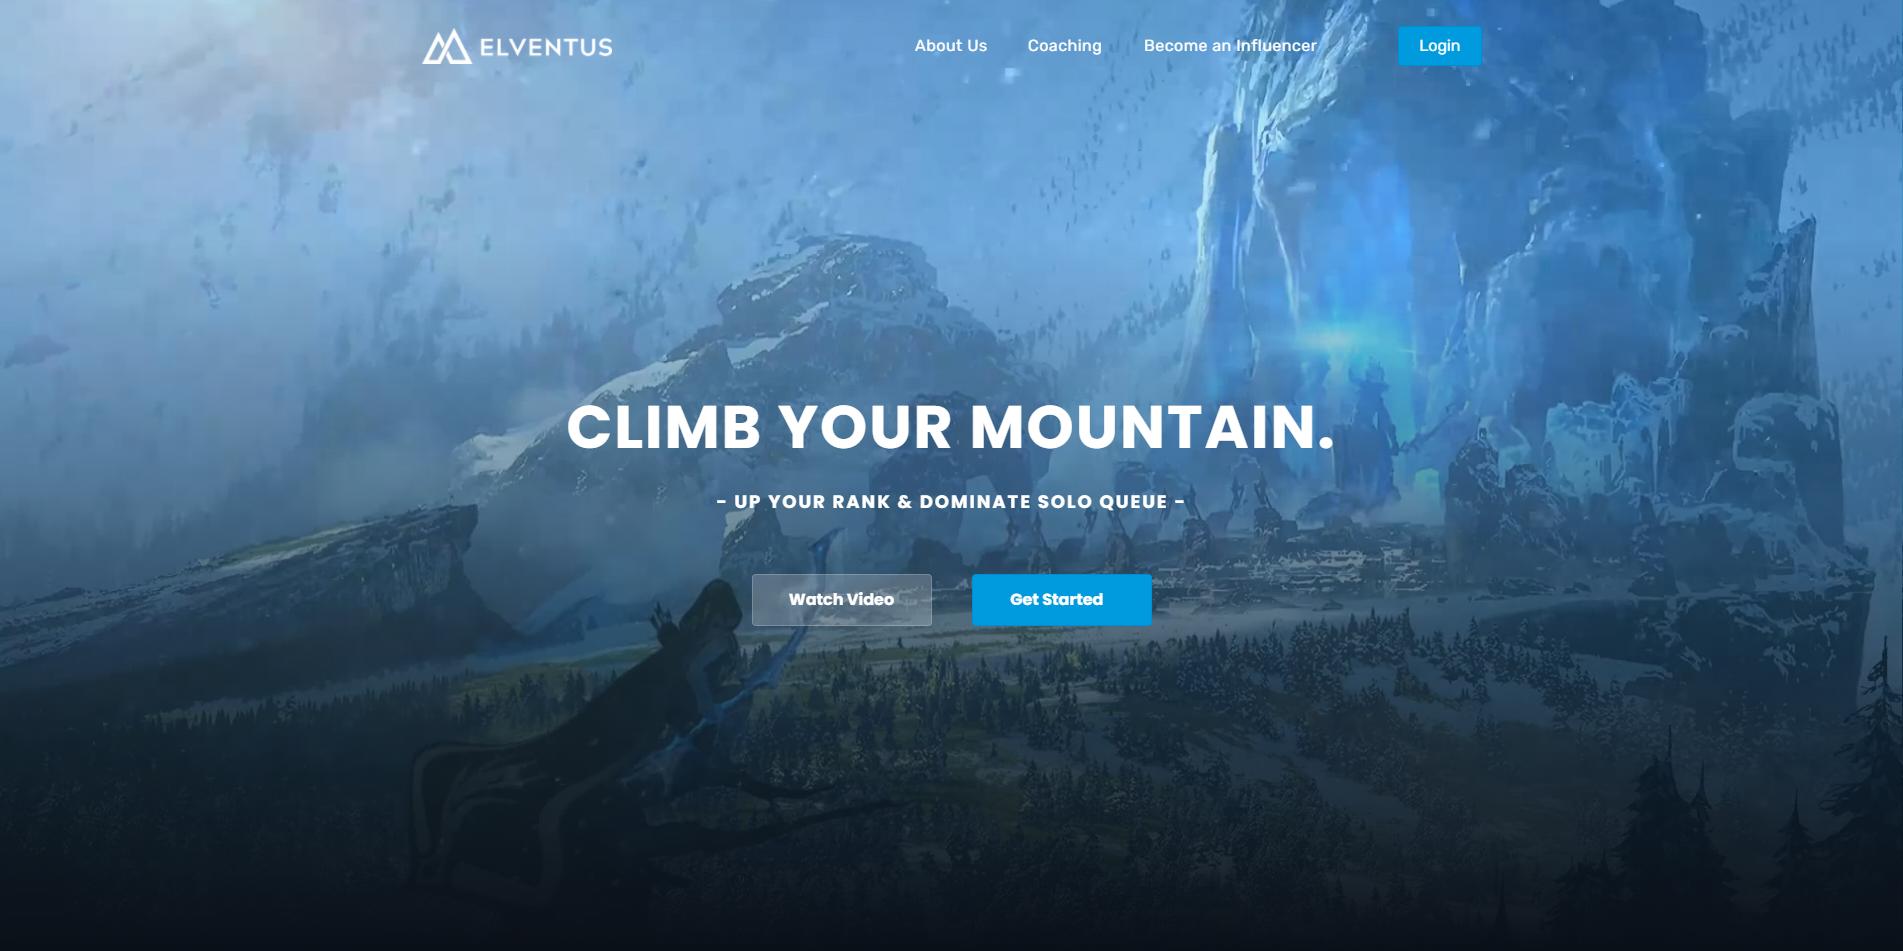 Elventus-Climb-your-mountain-Elventus